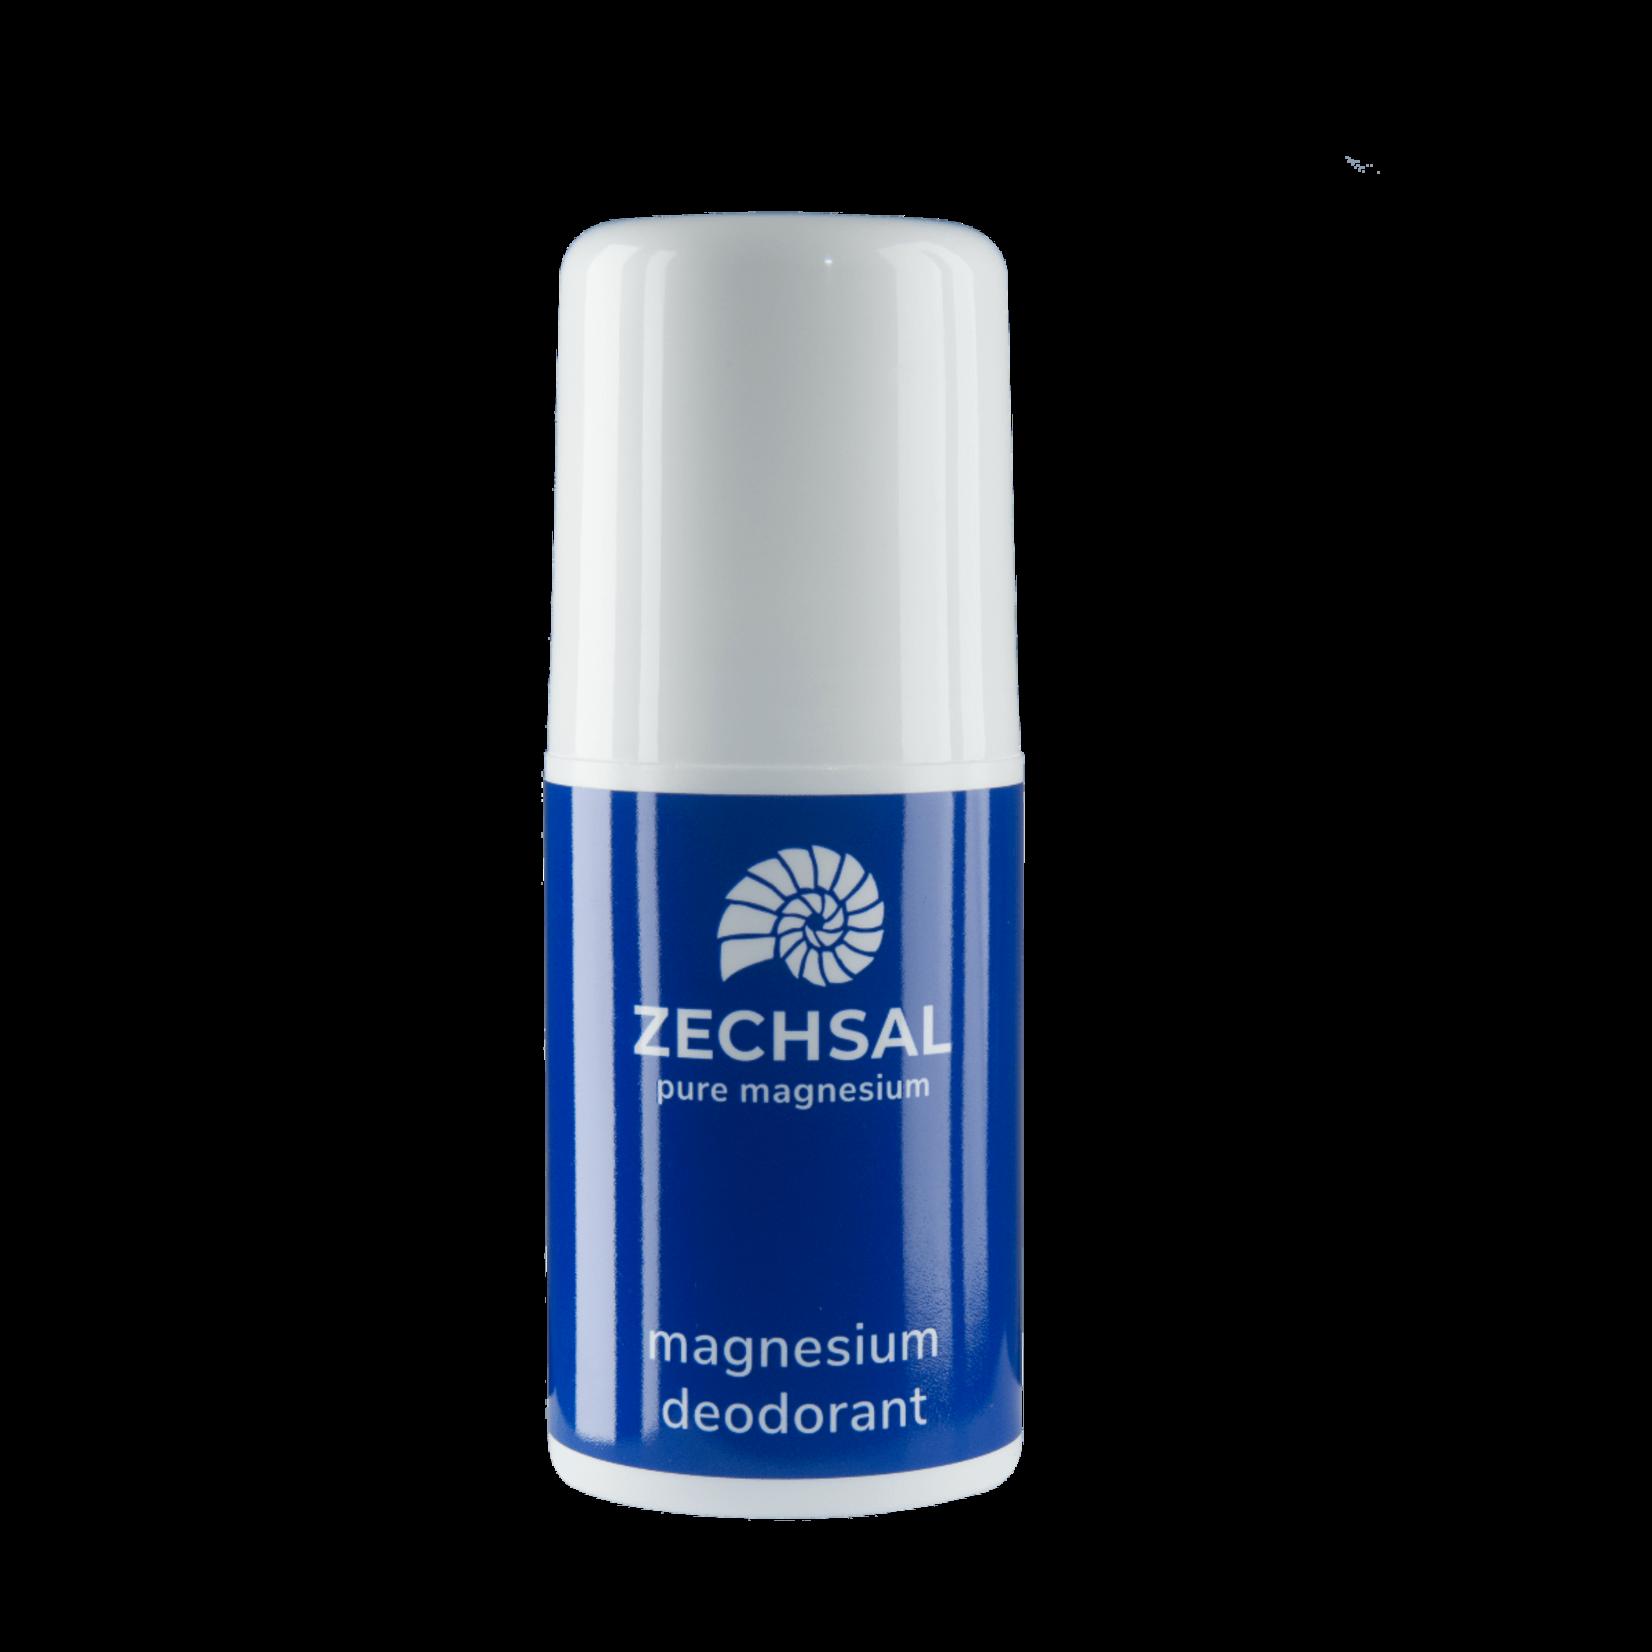 Zechsal Zechsal magnesium deodorant - na drie weken gebruik wil je niks anders meer!